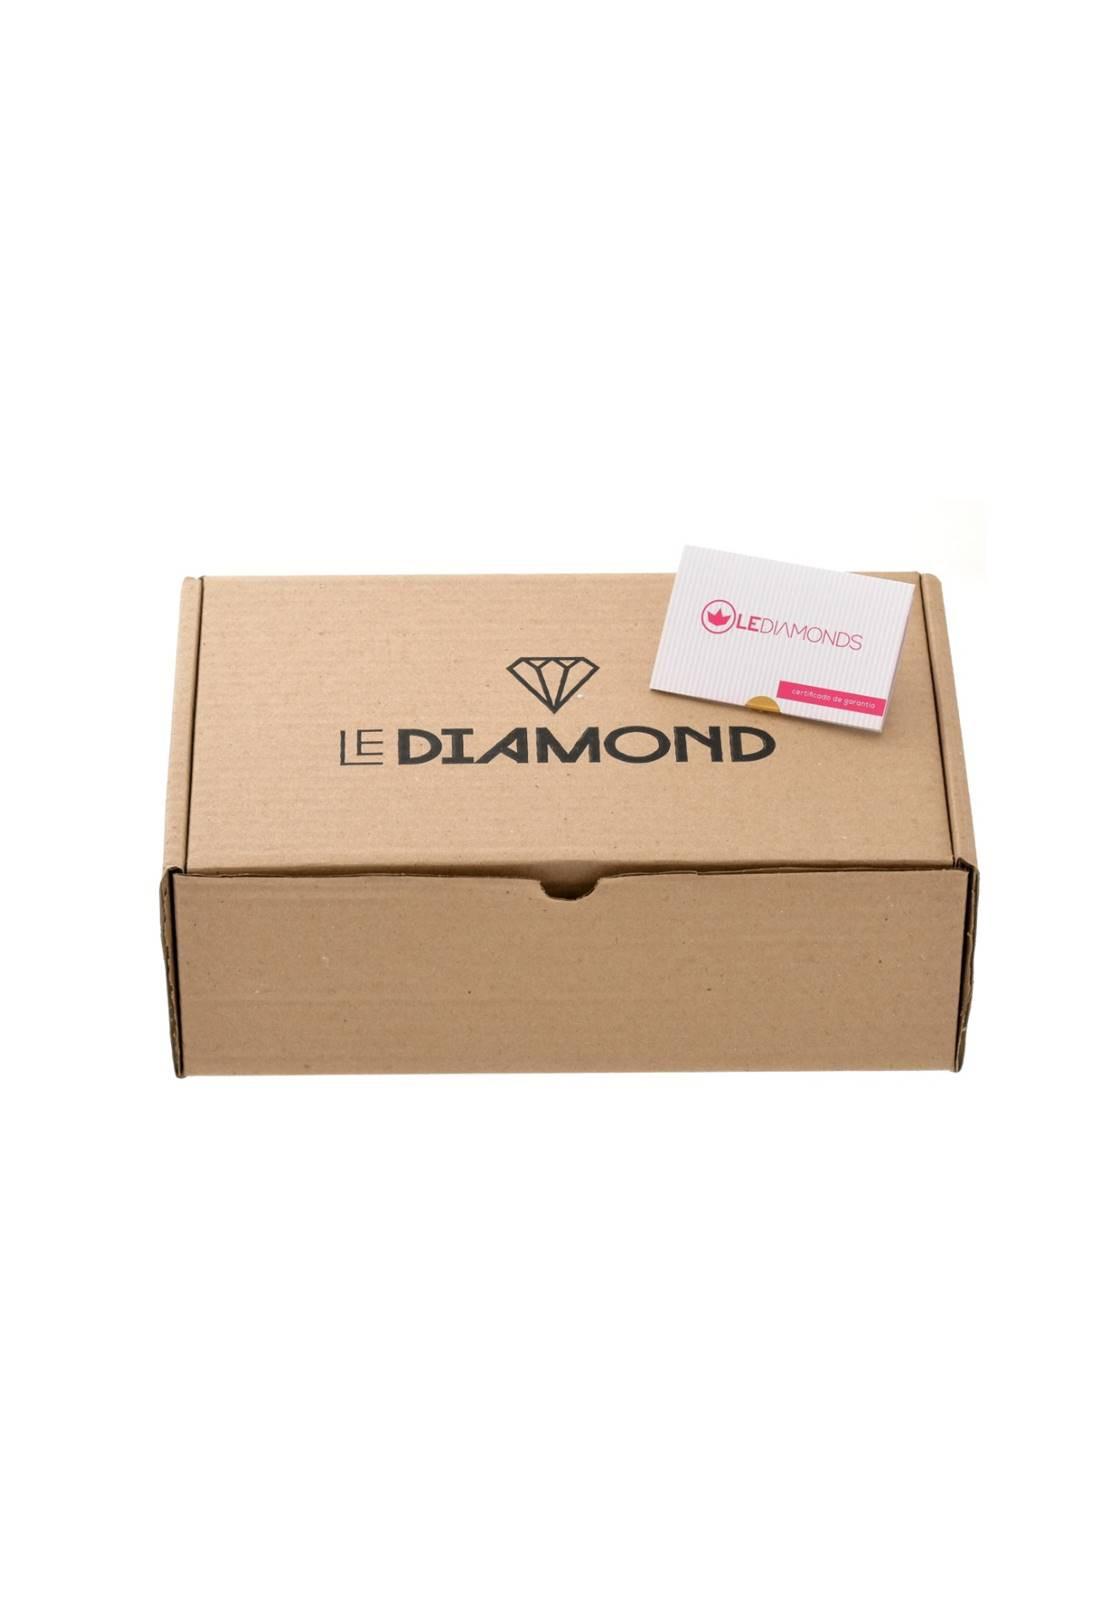 Brinco Caspio  Le Diamond  Vemelho